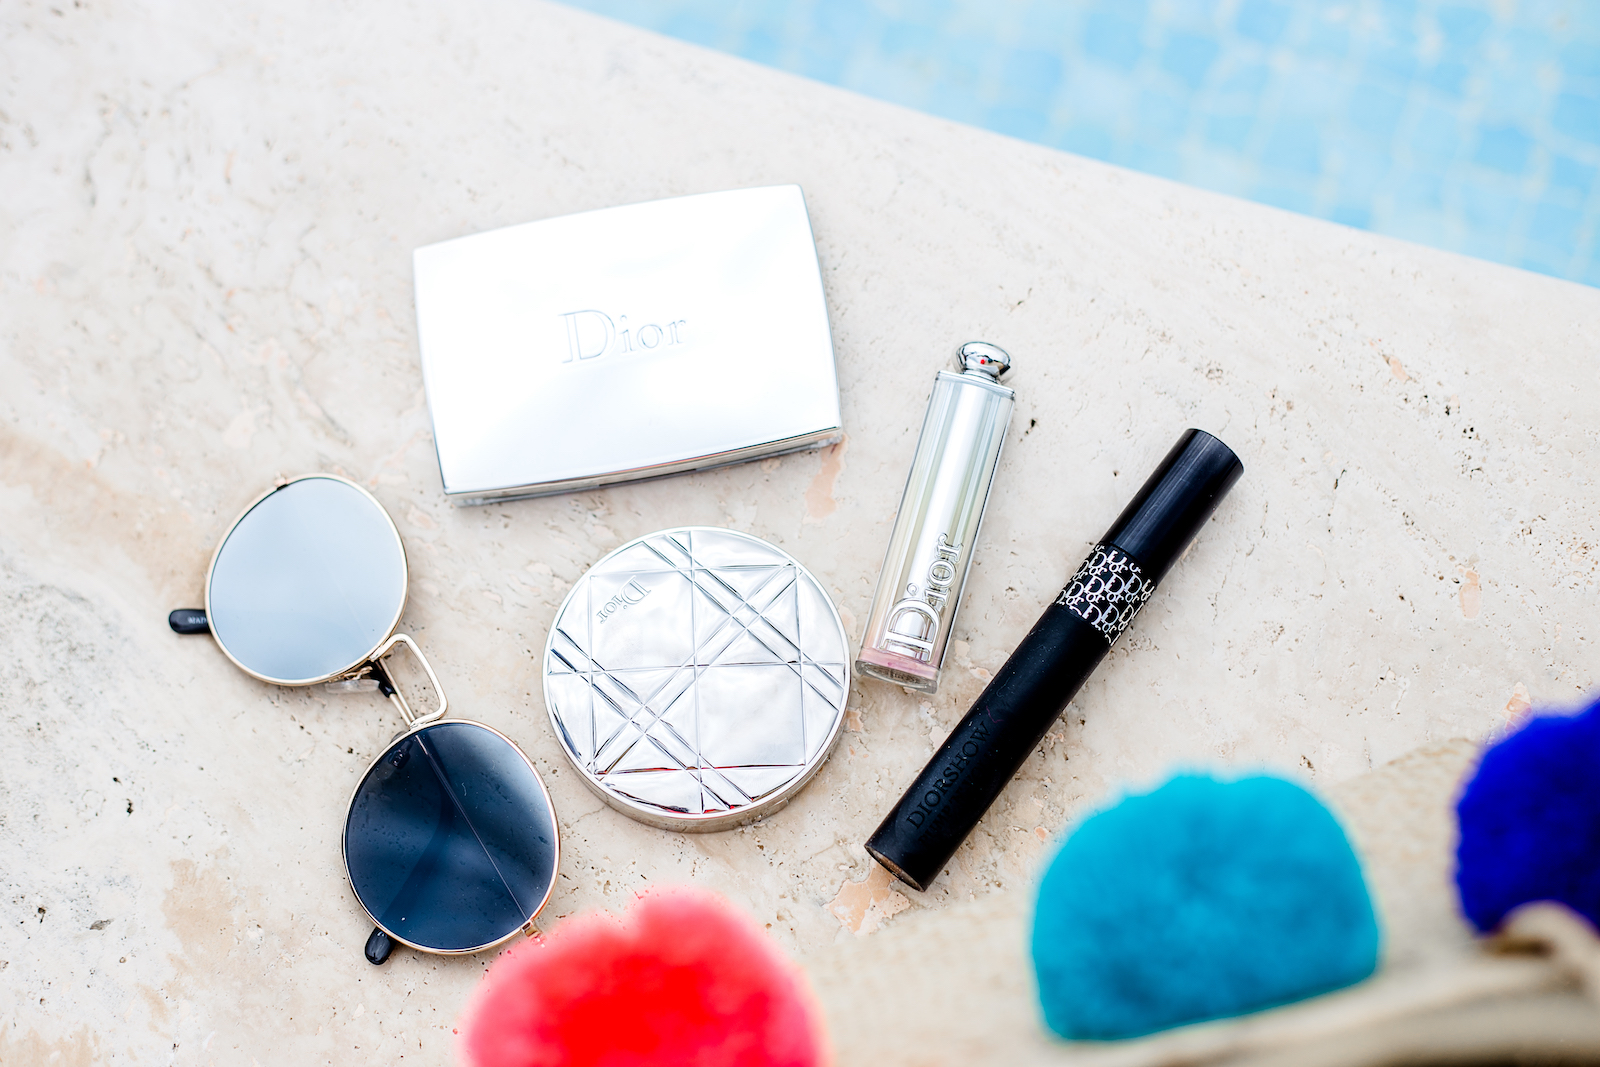 dior-care&dare-lipstick-pump'n'volume-mascara-livia-auerIMG_6320